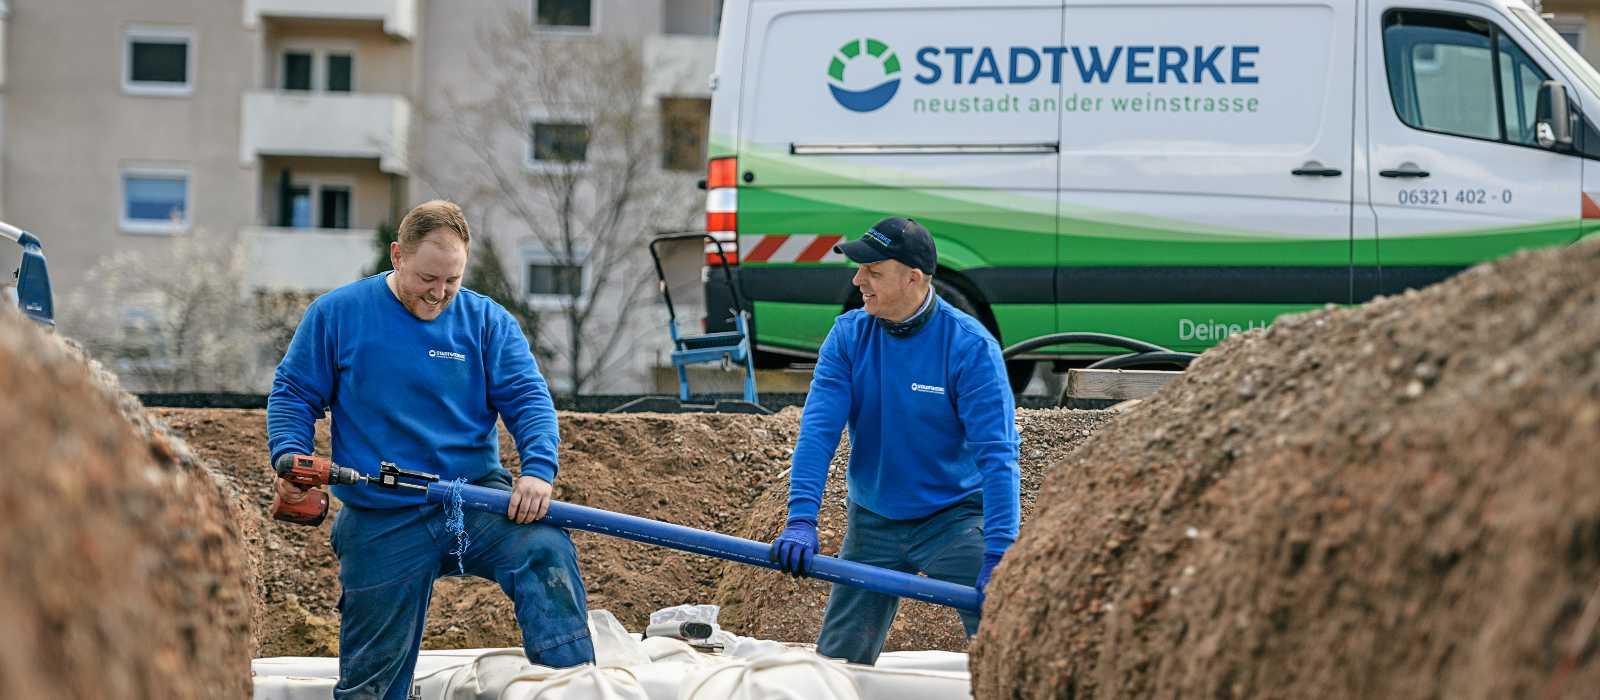 Stadtwerke Neustadt Service Kundenservice Kachel Baustellen Arbeiter © AD LUMINA Ralf Ziegler